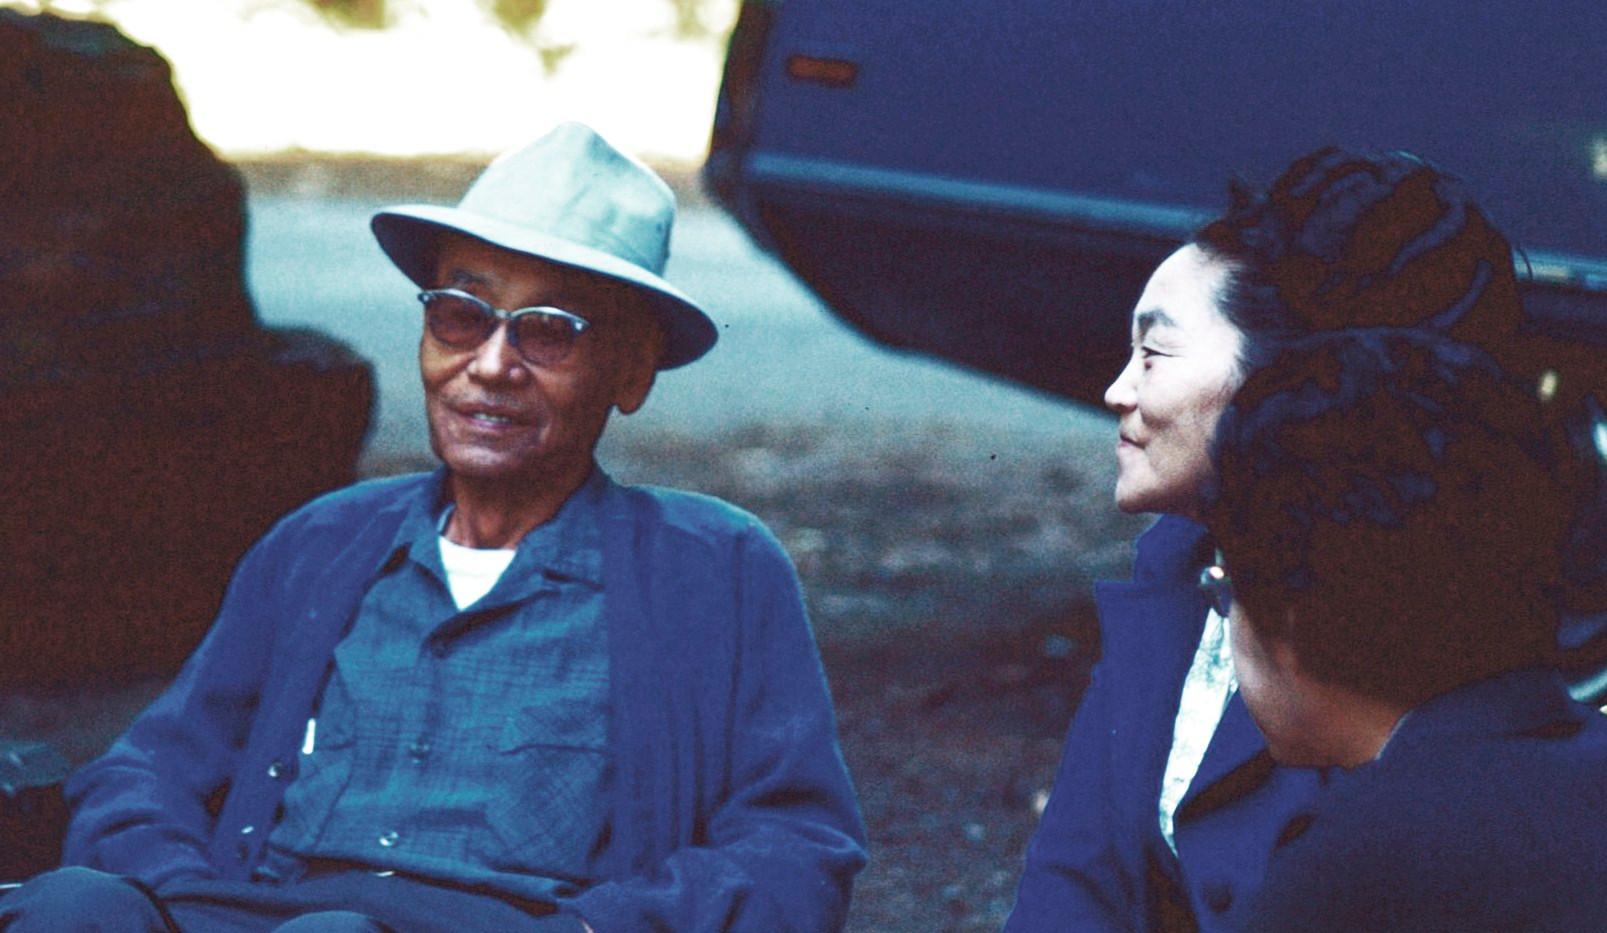 Itaya Family reunion - Takuzo and Mildred Hamamoto (ca. 1974)